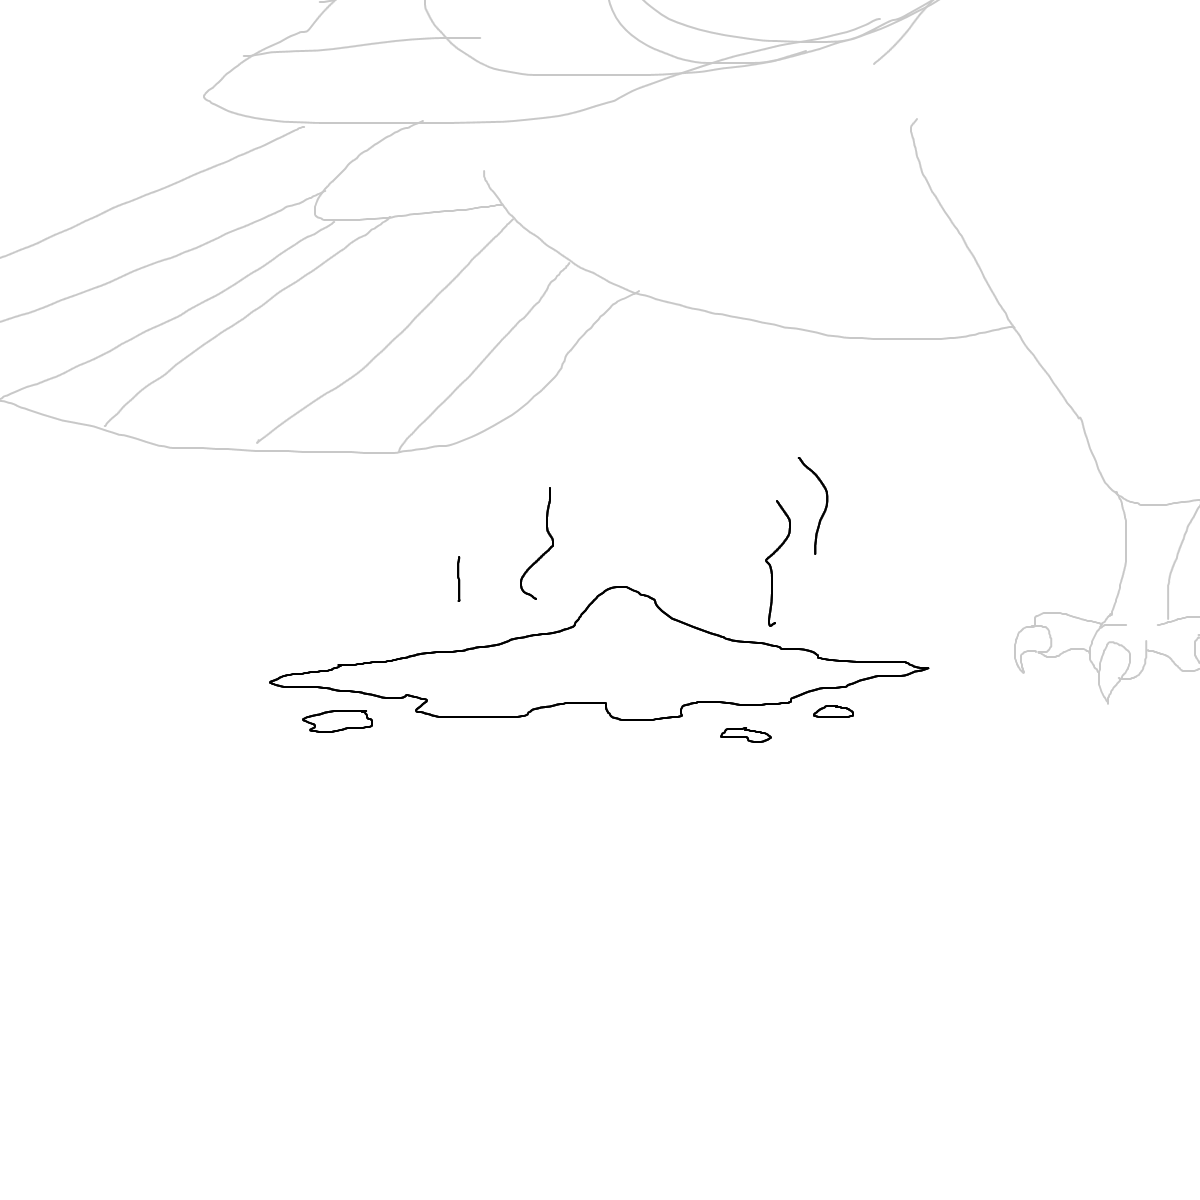 BAAAM drawing#23363 lat:41.9478149414062500lng: -87.6558151245117200